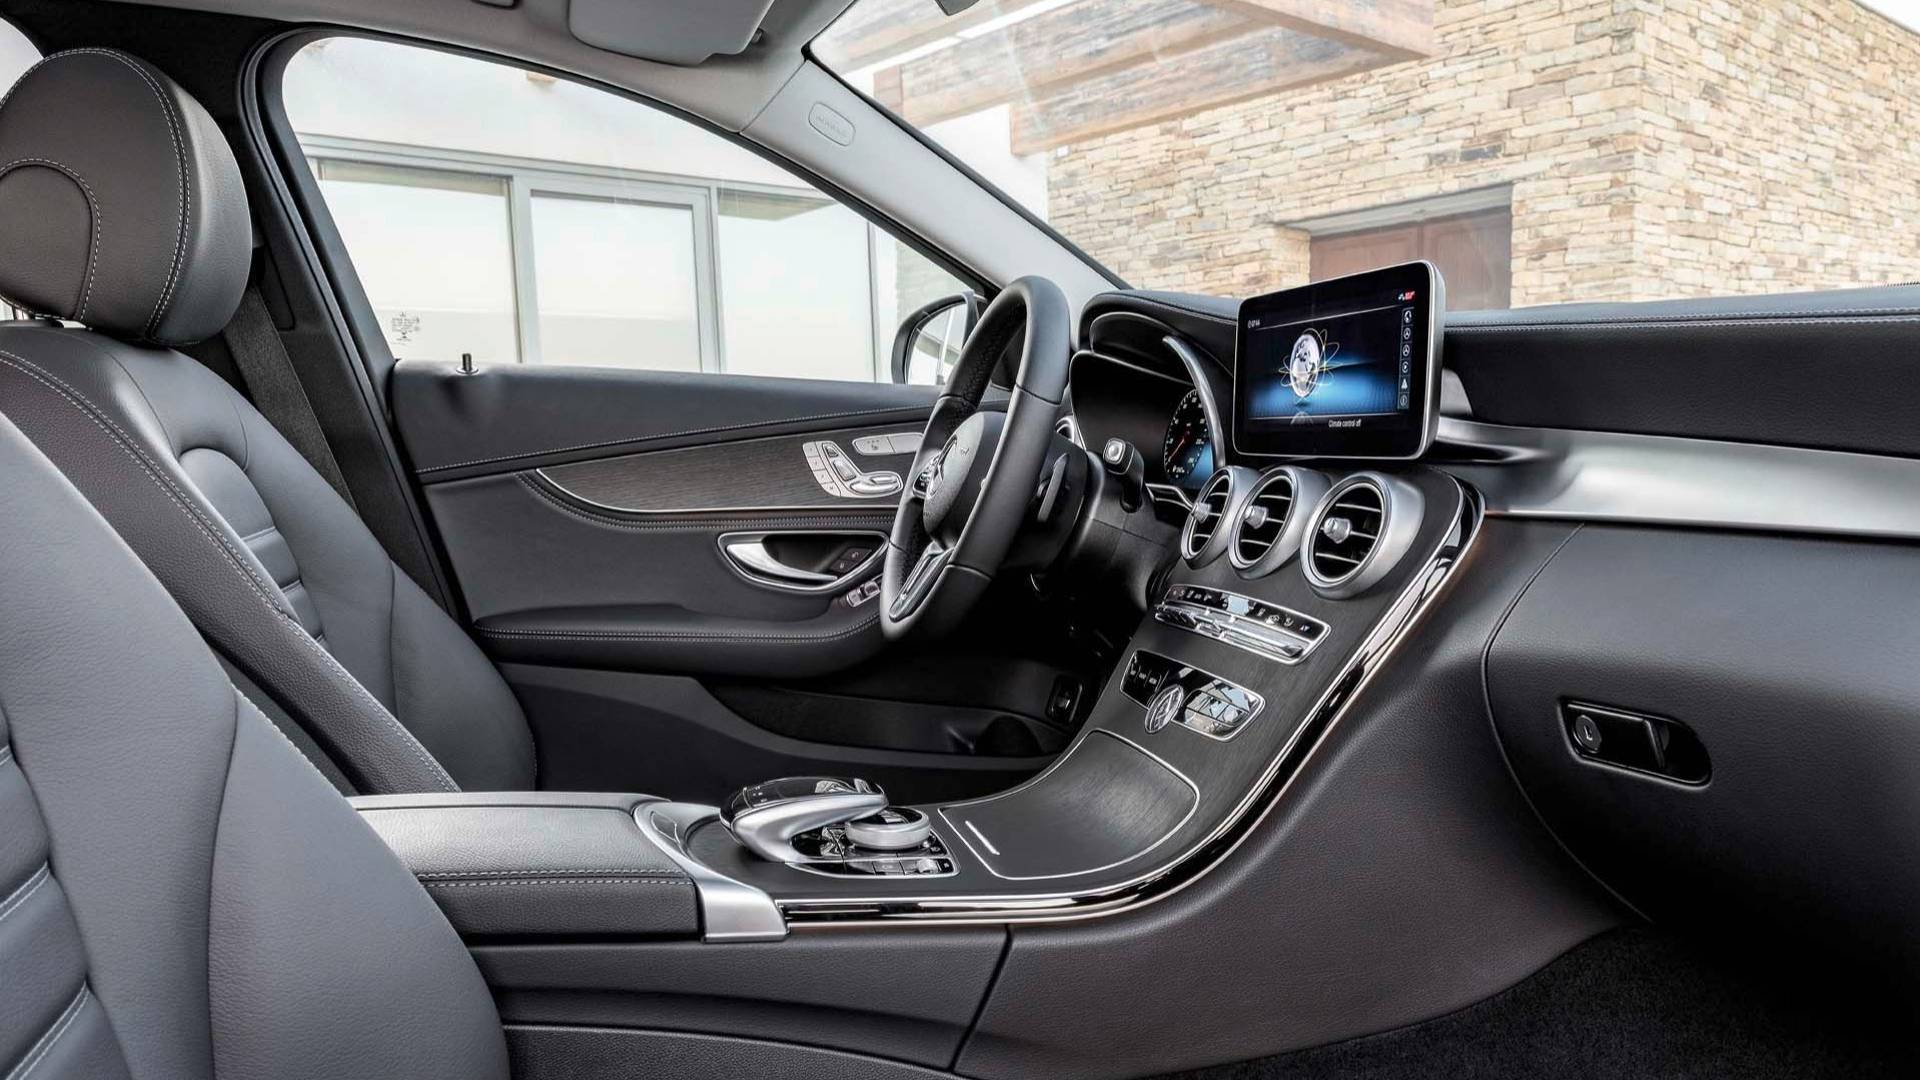 2019-mercedes-benz-c-class-sedan.jpg